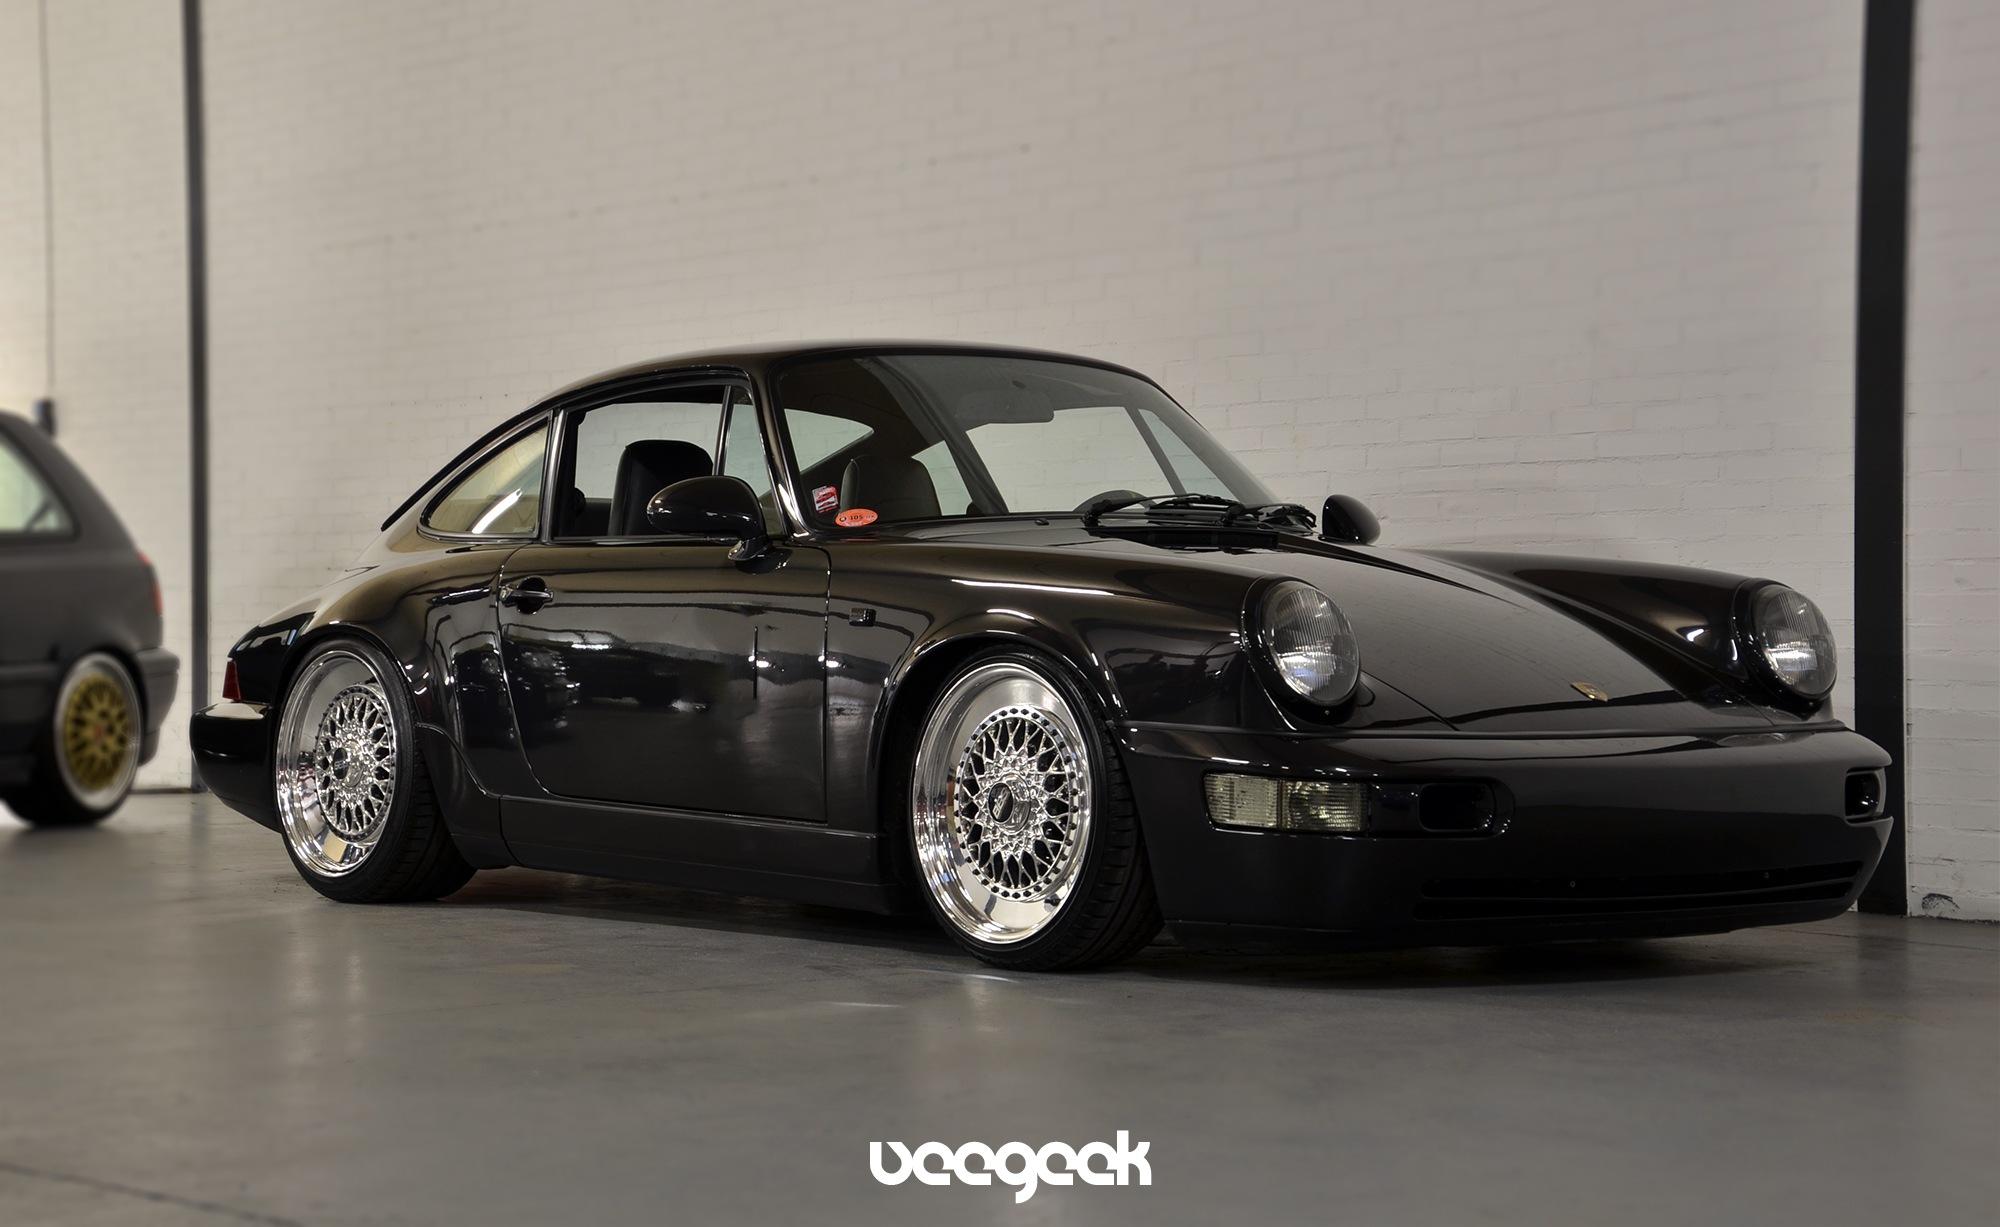 Blanz Porsche by VeeGeek